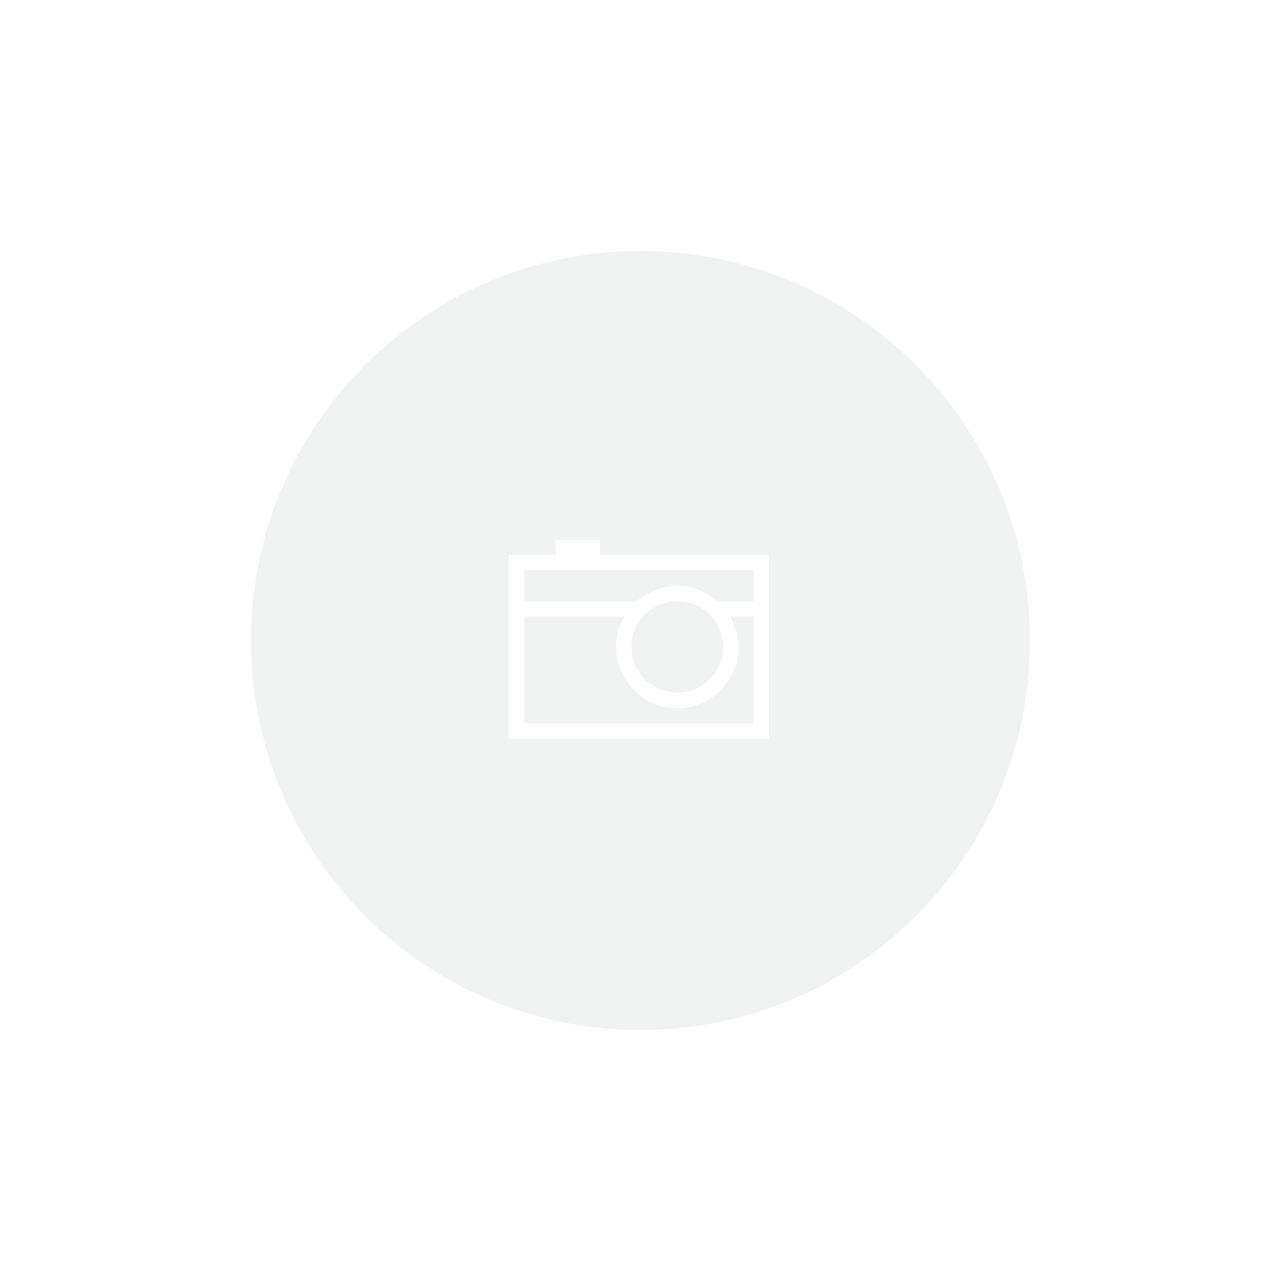 Papel Artesanal Indiano - Ref. 56